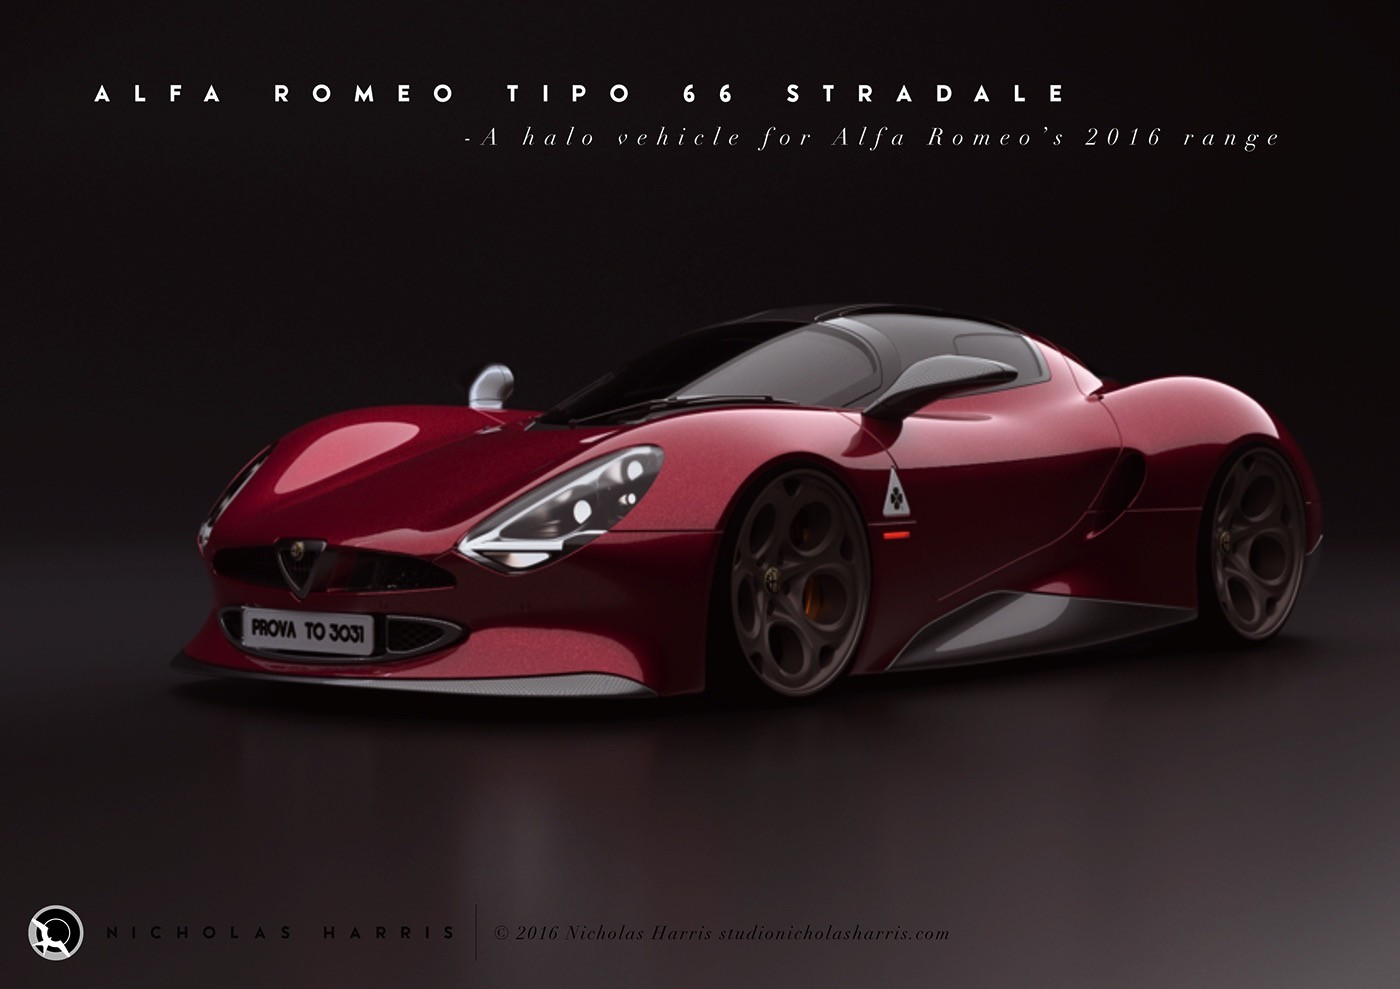 Alfa Romeo Tipo 66 Stradale (2)